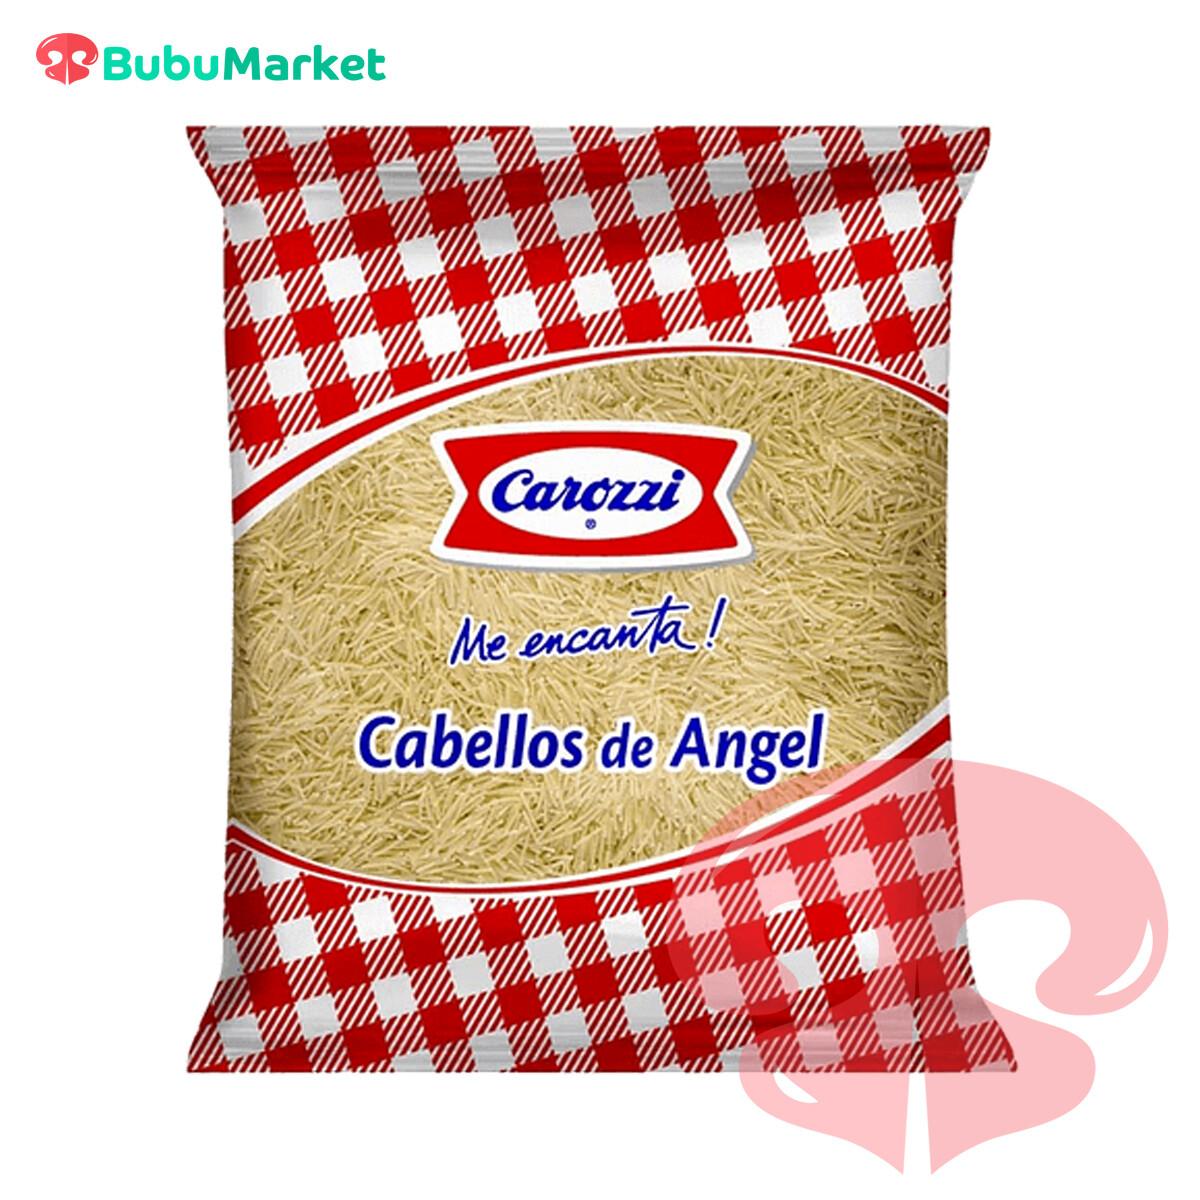 FIDEOS CAROZZI CABELLOS DE ANGEL BOLSA DE 400 GR.